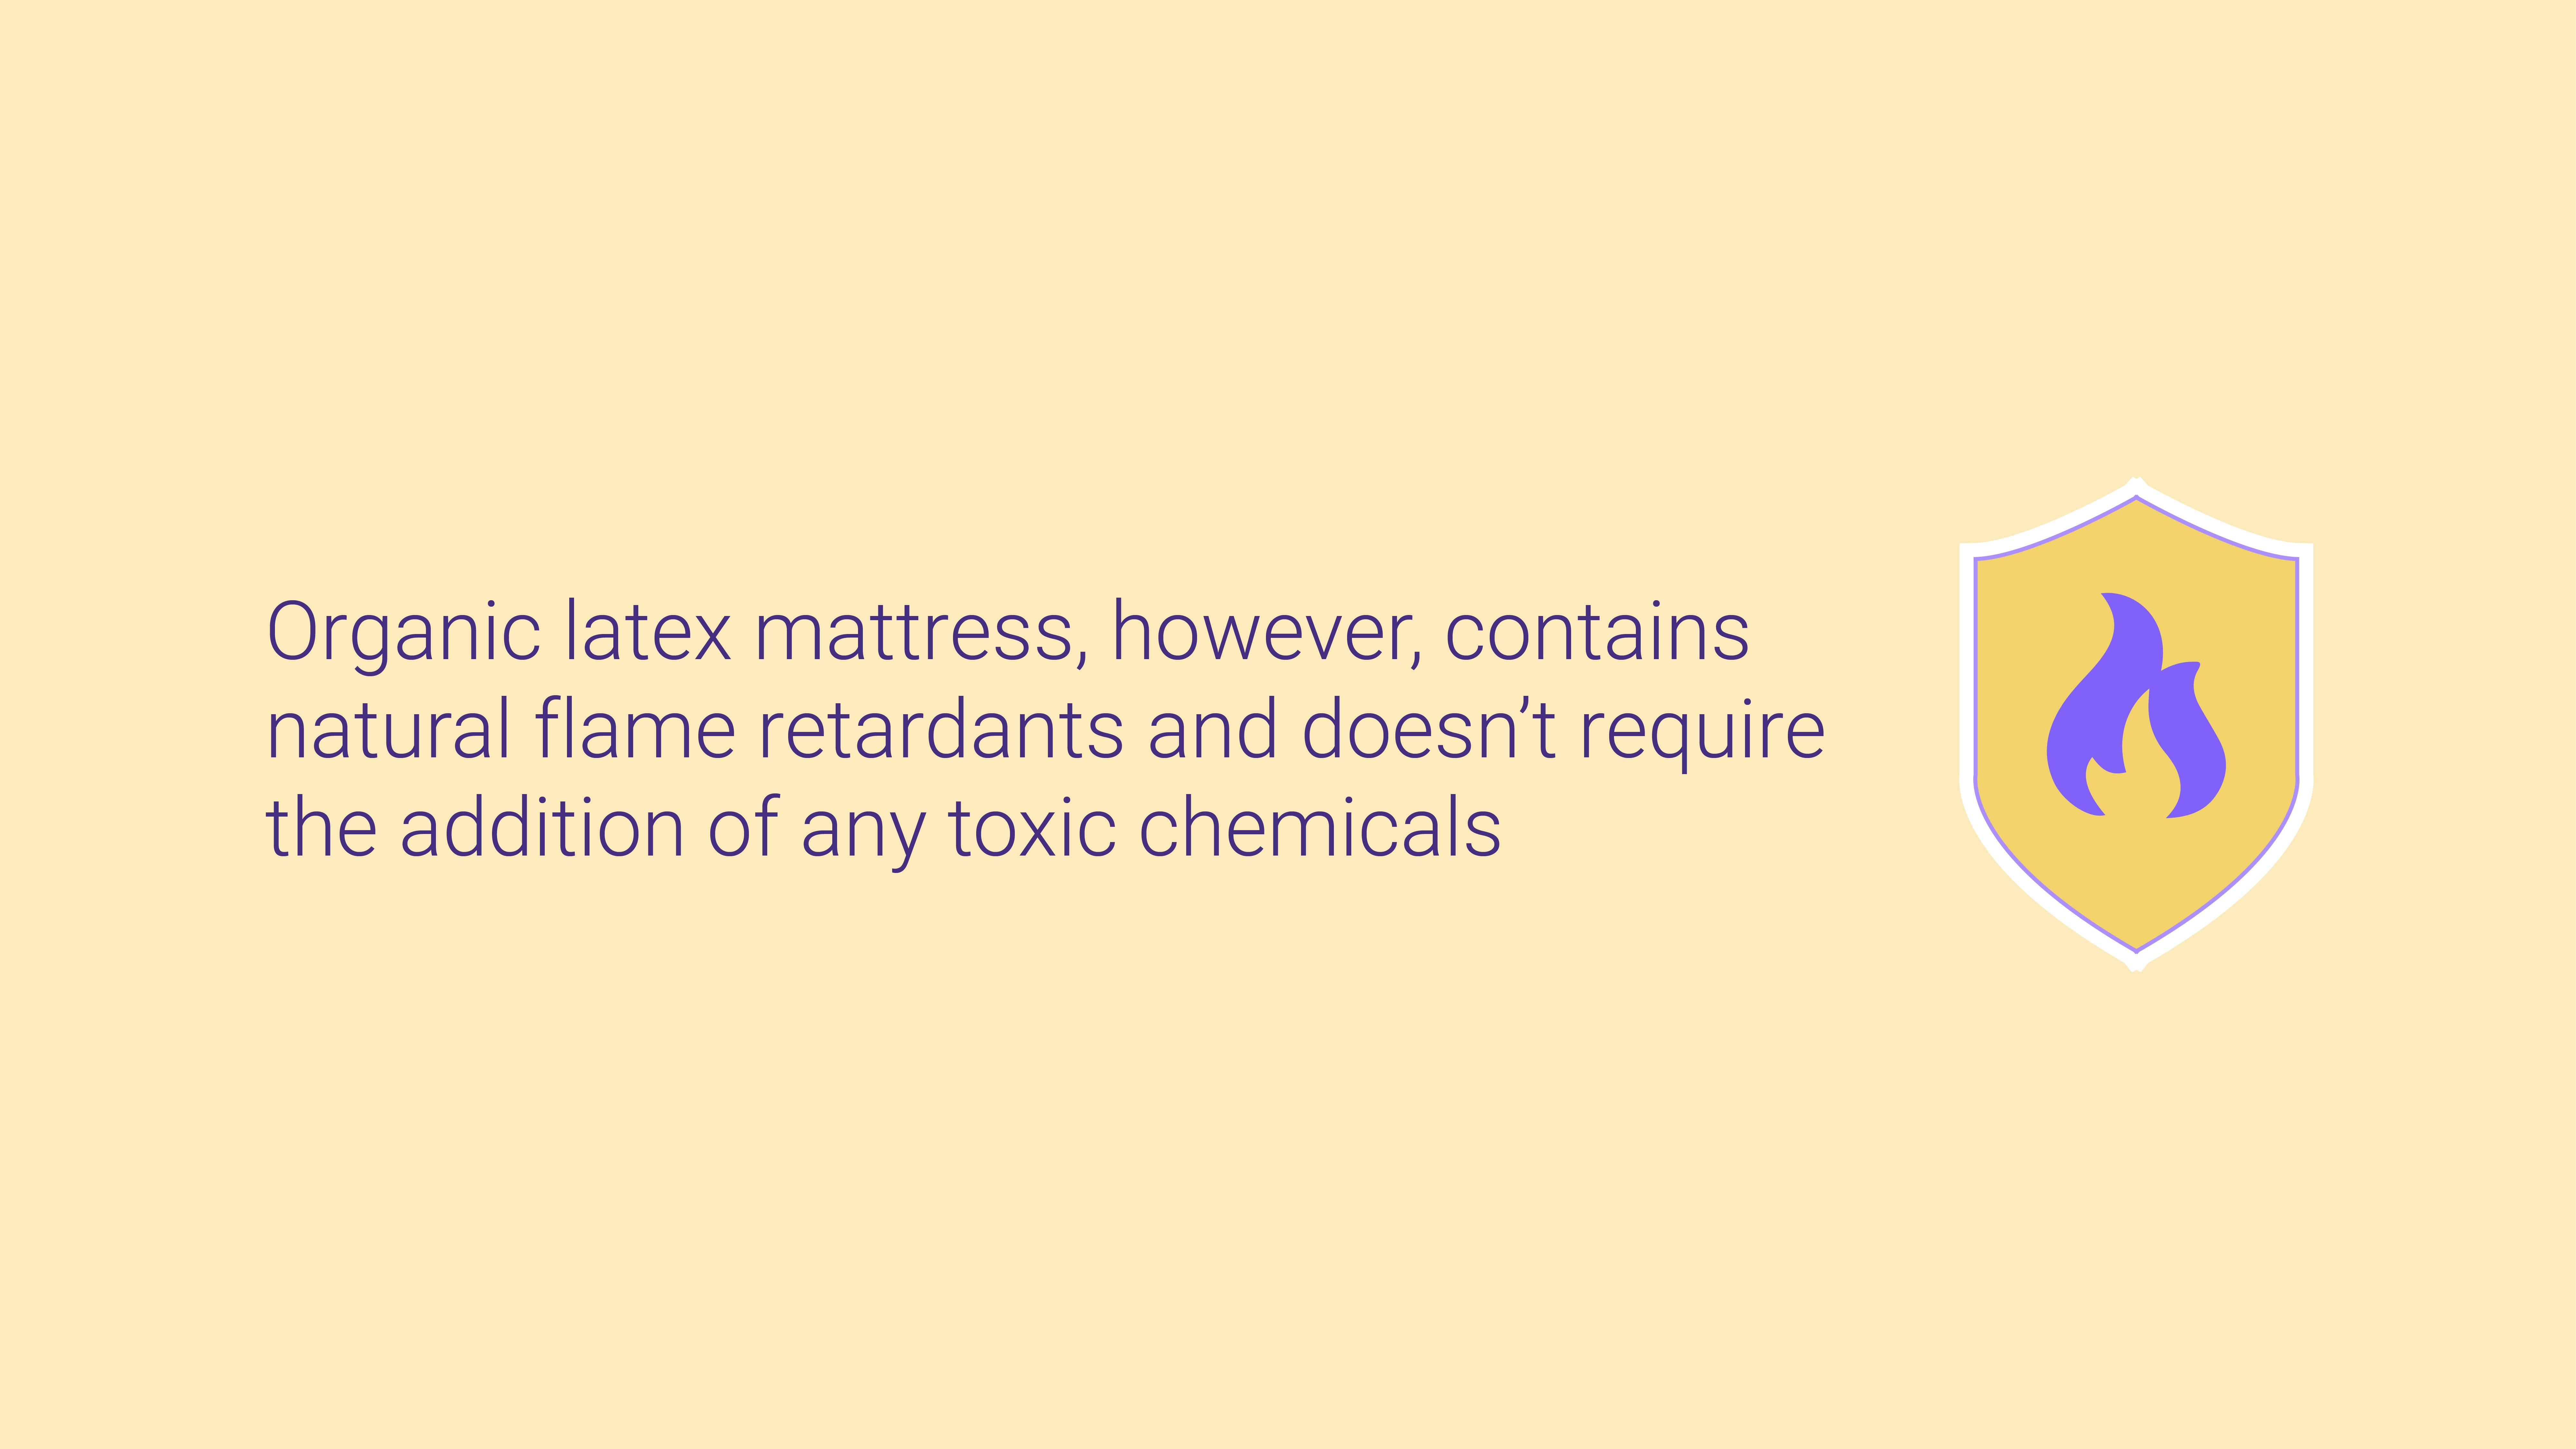 Benefits of a Latex Mattress